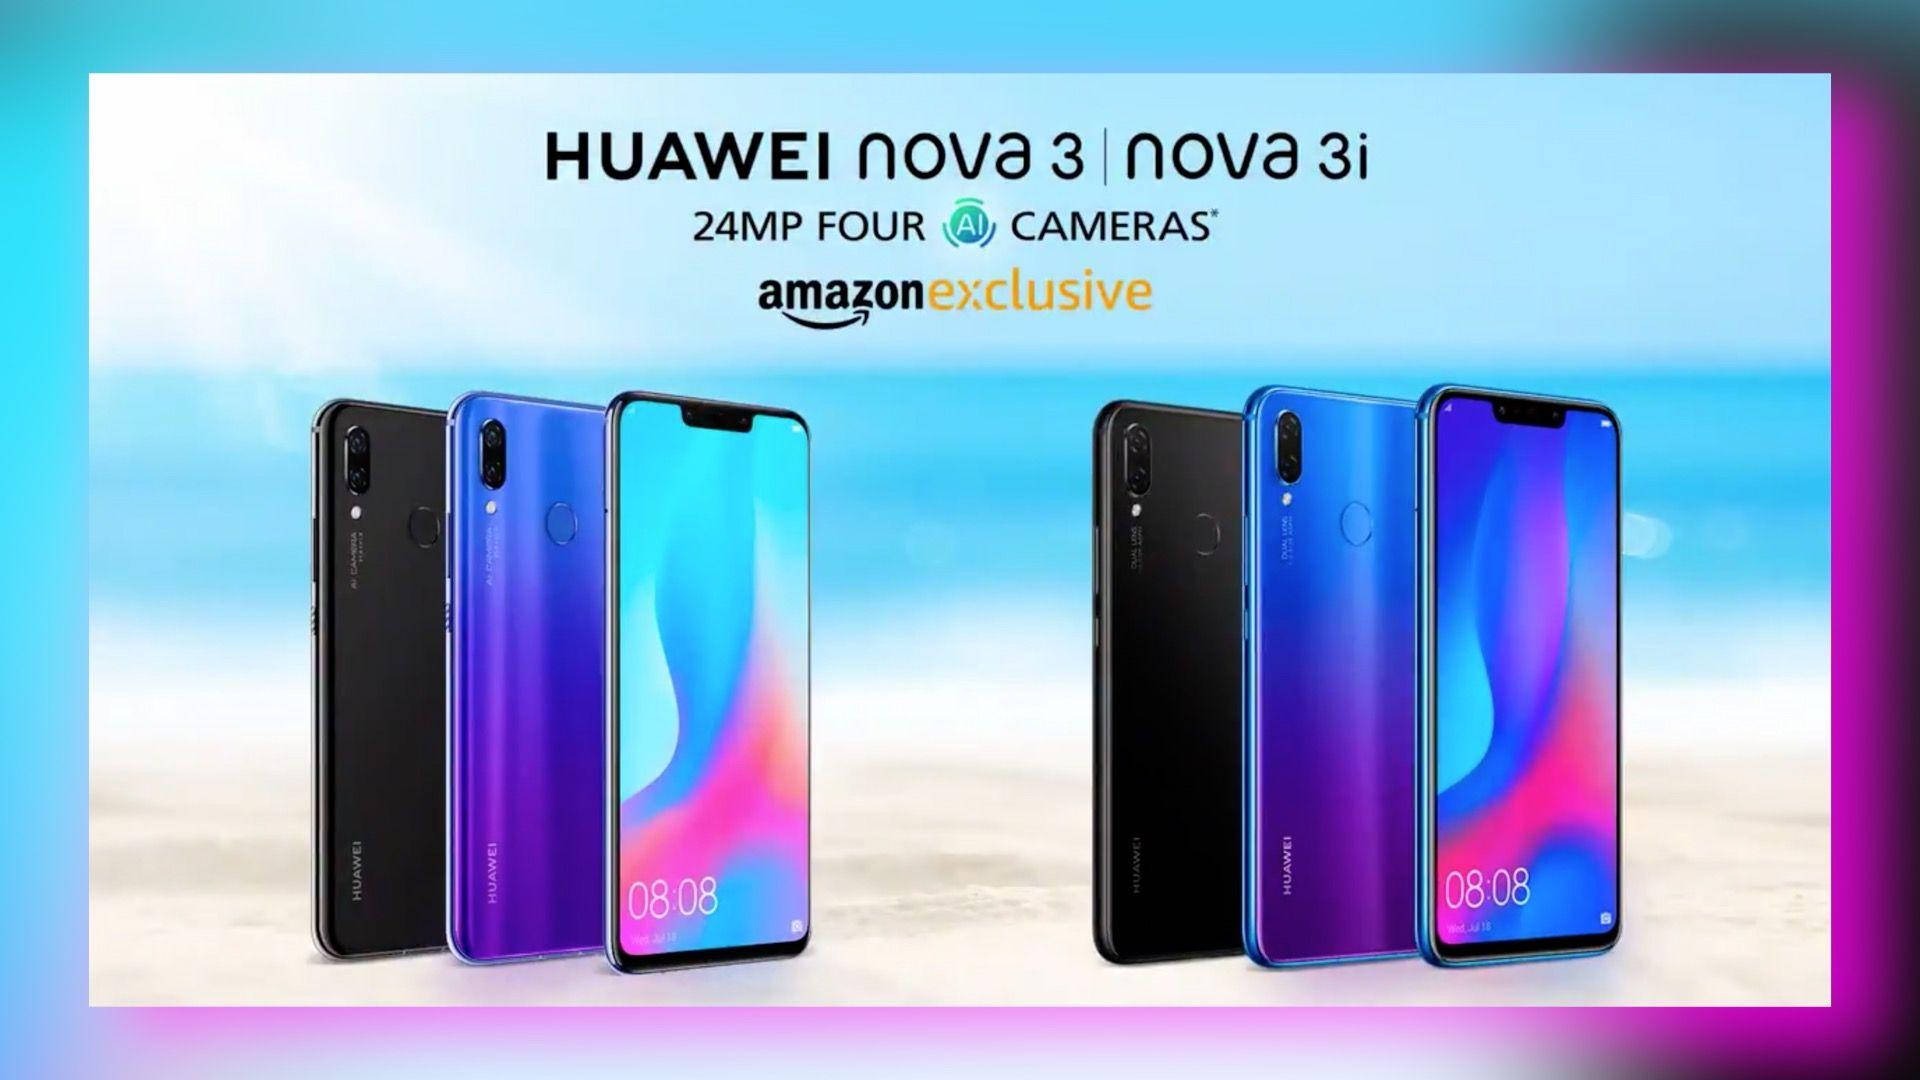 Huawei Nova 3 & Nova 3i Smartphones Launched In India: Price